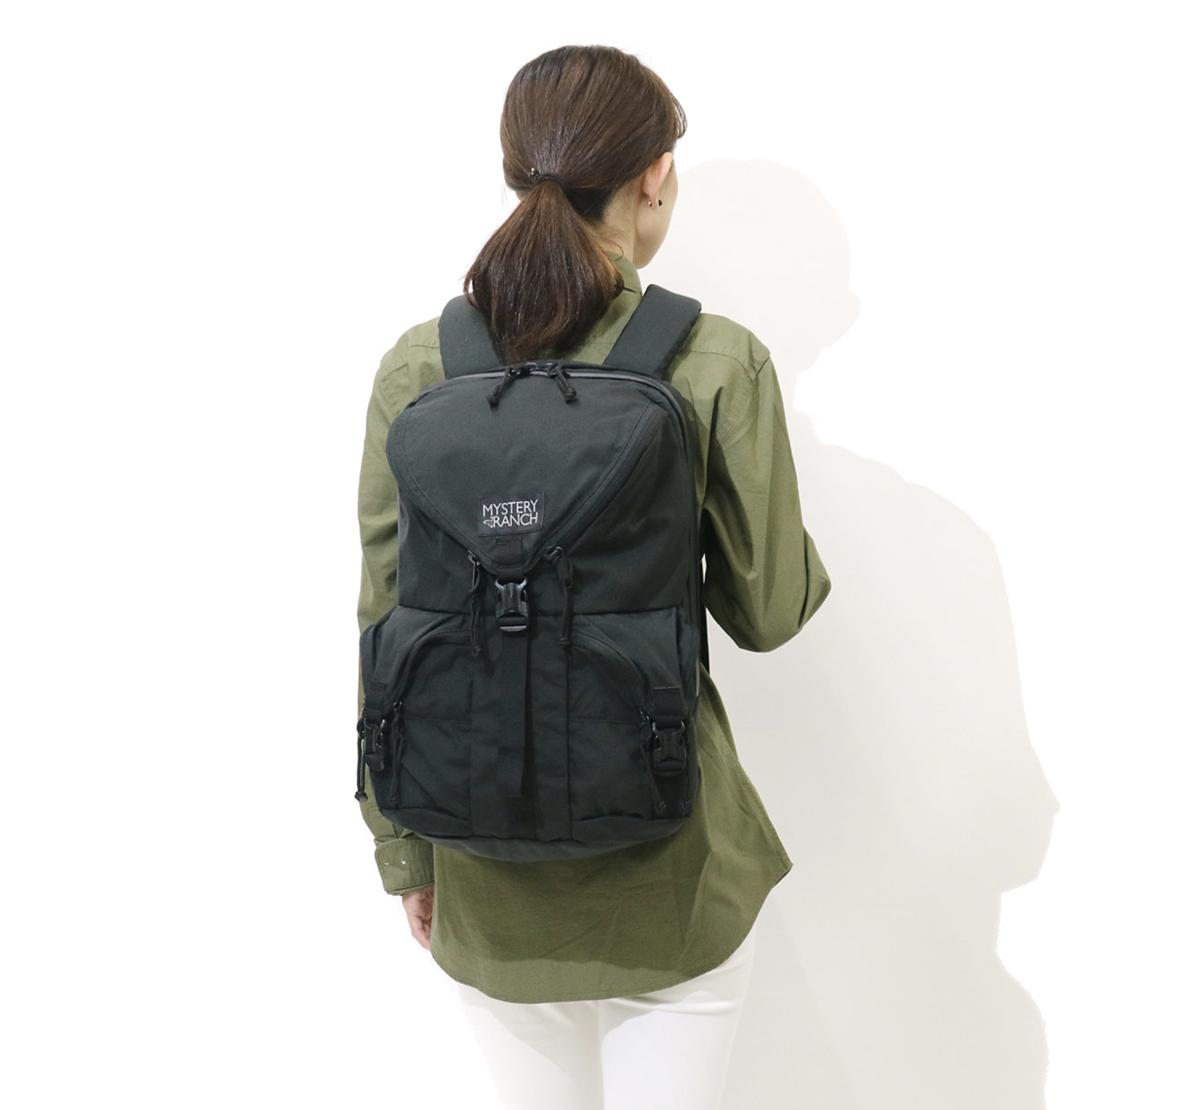 f:id:thebackpack:20190317121320p:plain